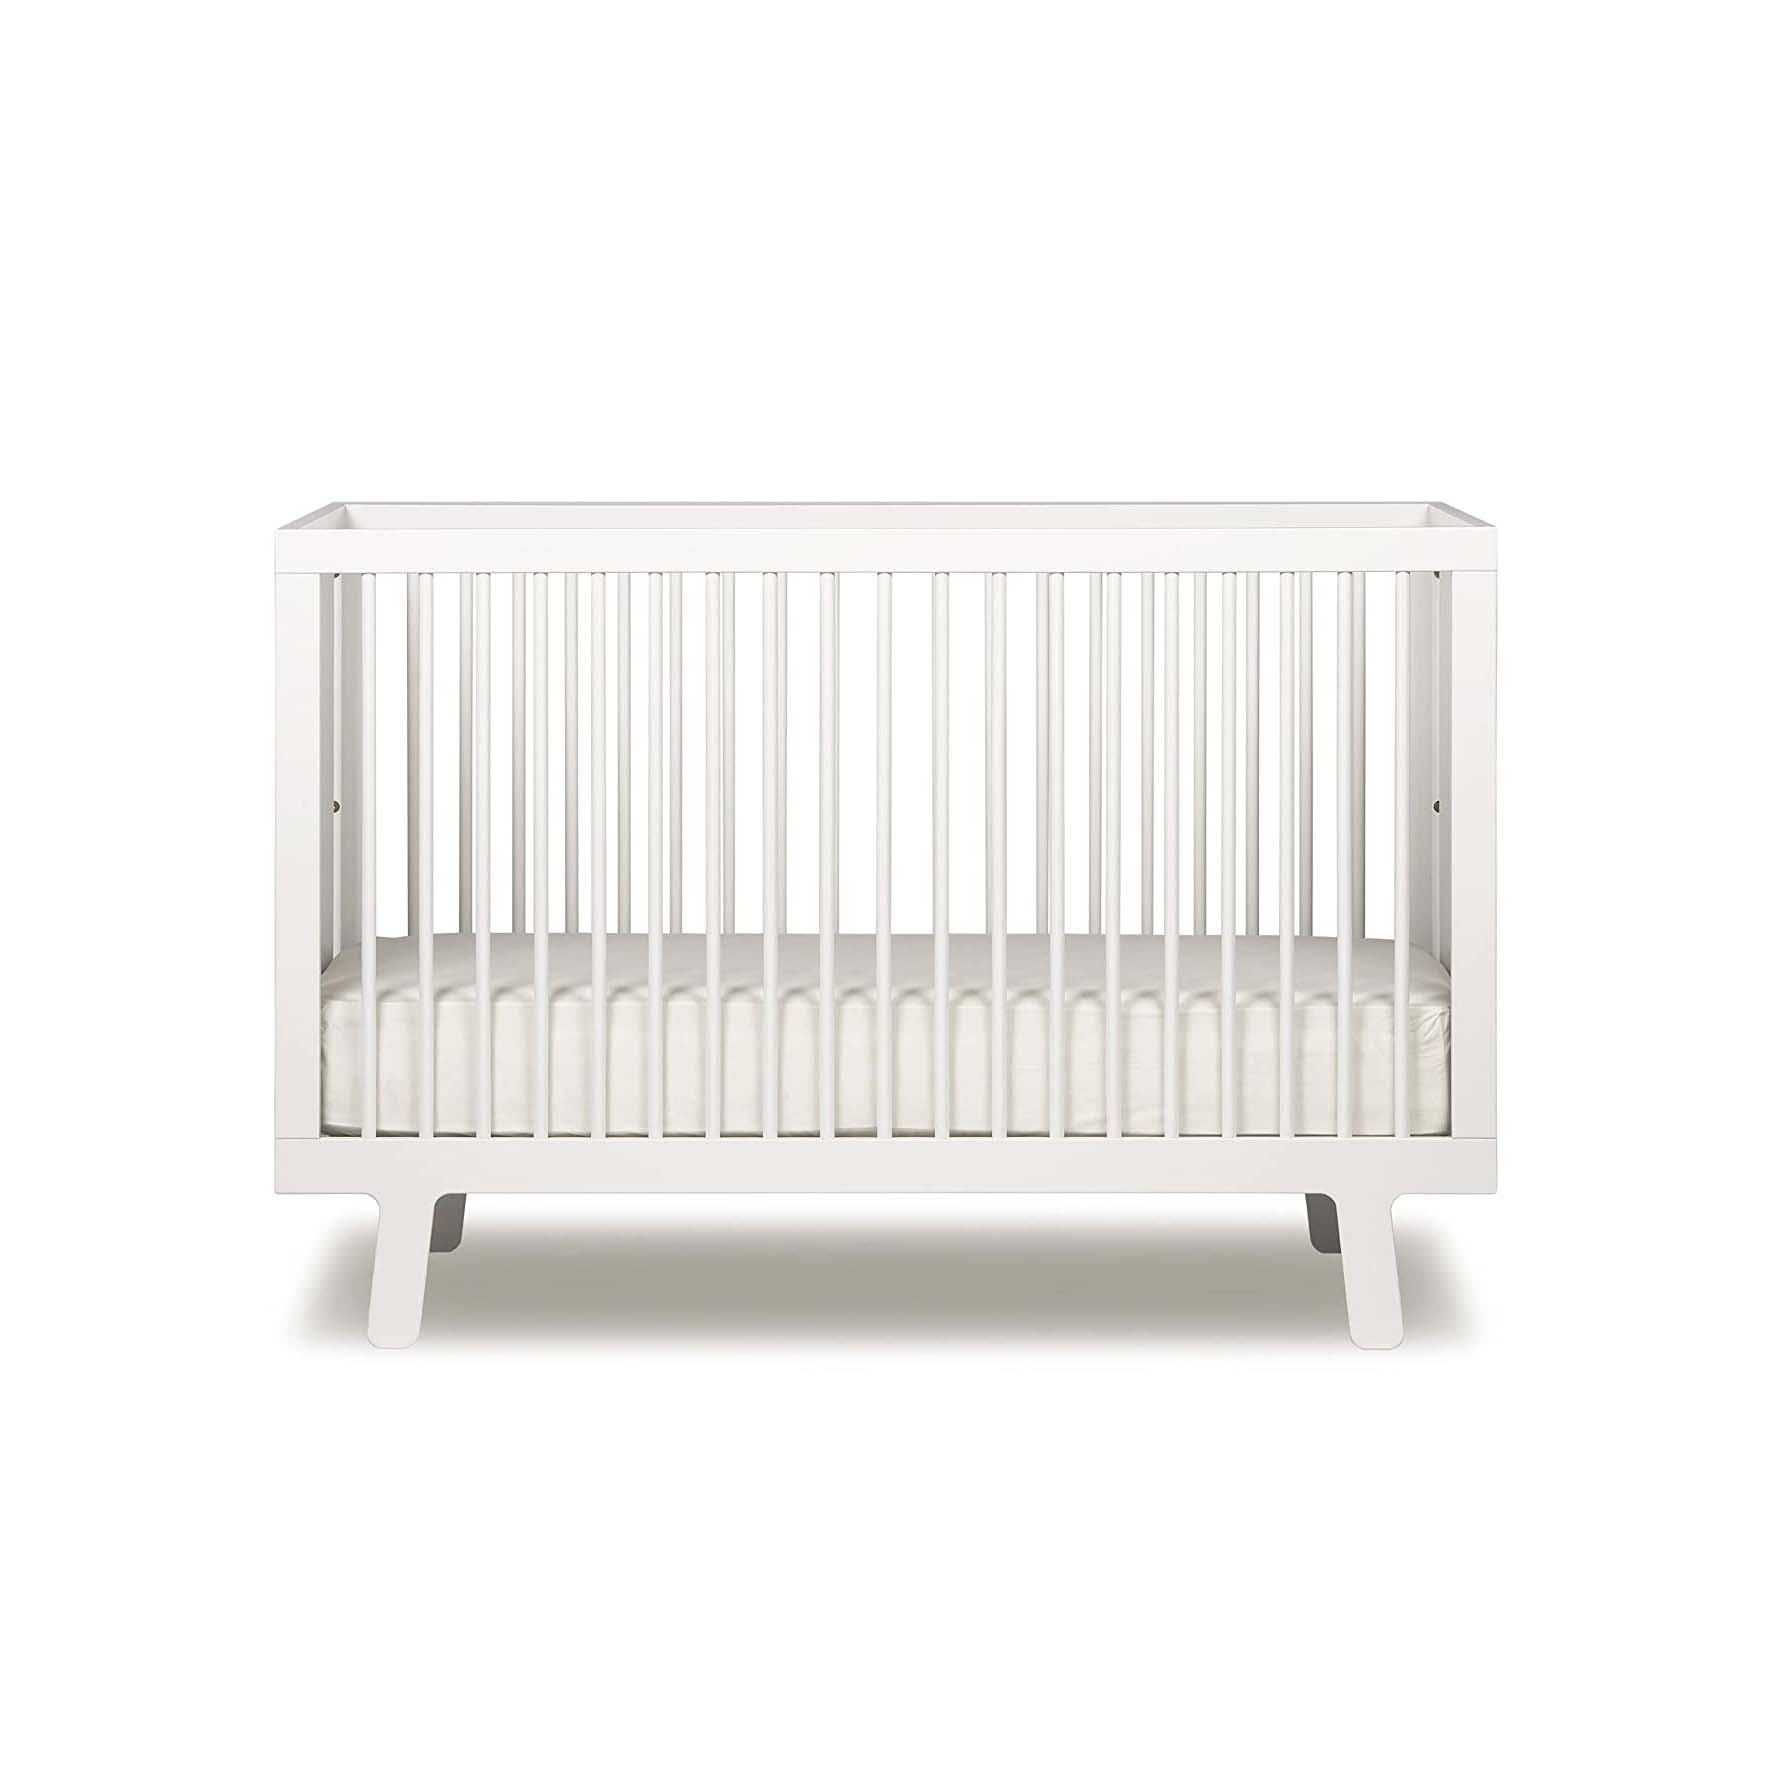 The-Best-Baby-Crib-Option-Oeuf-Sparrow-Crib